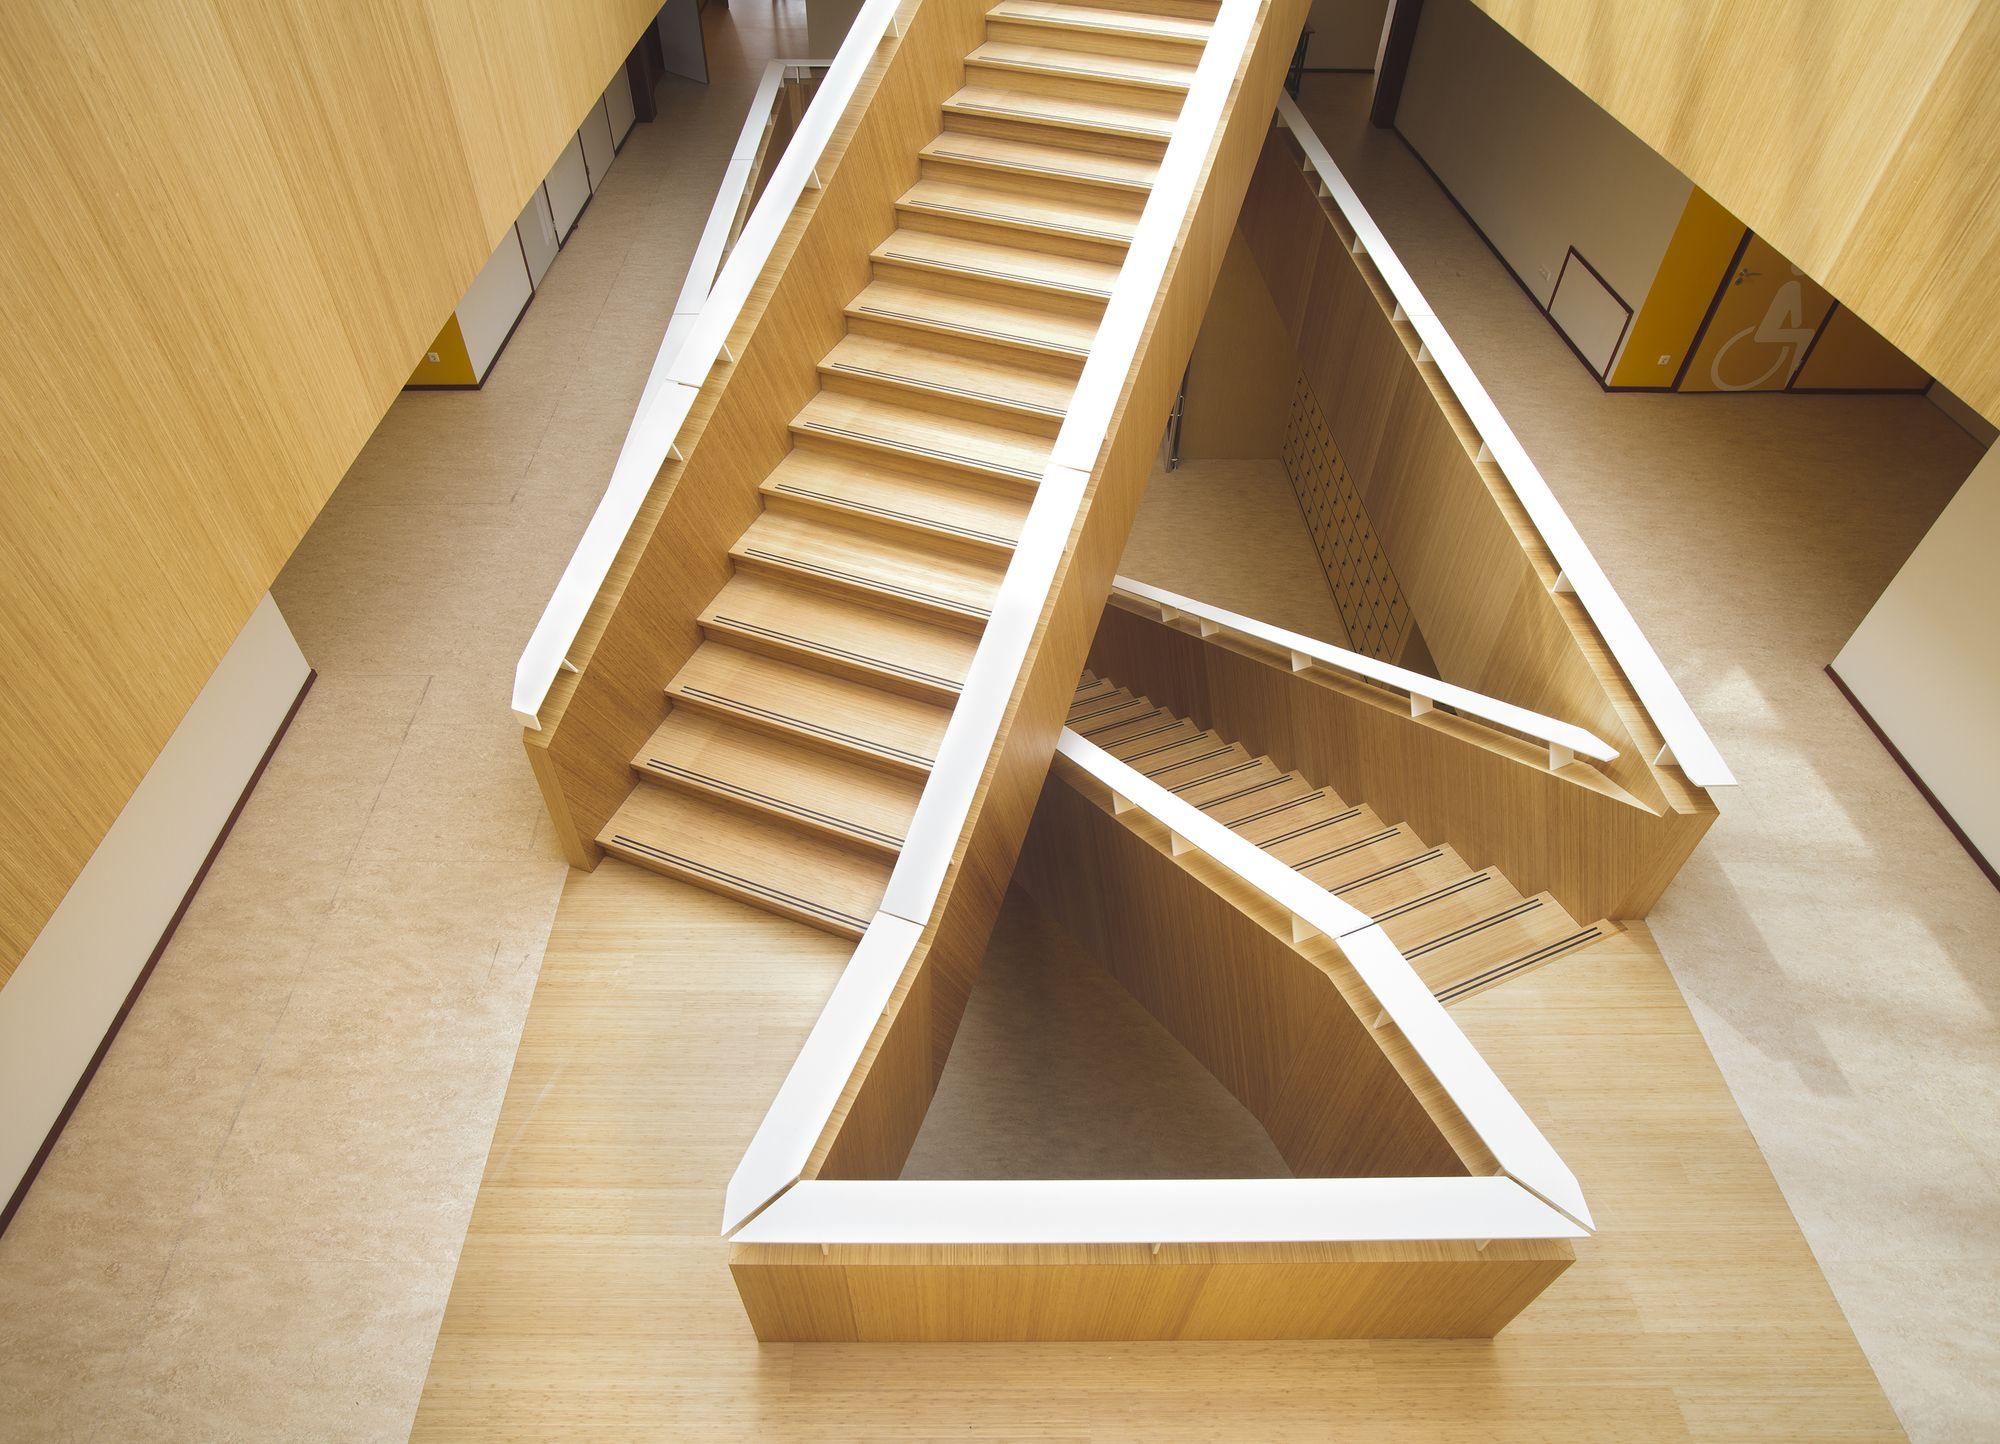 Innenarchitektur Hochschulen pin george inasaridze auf stairs railings